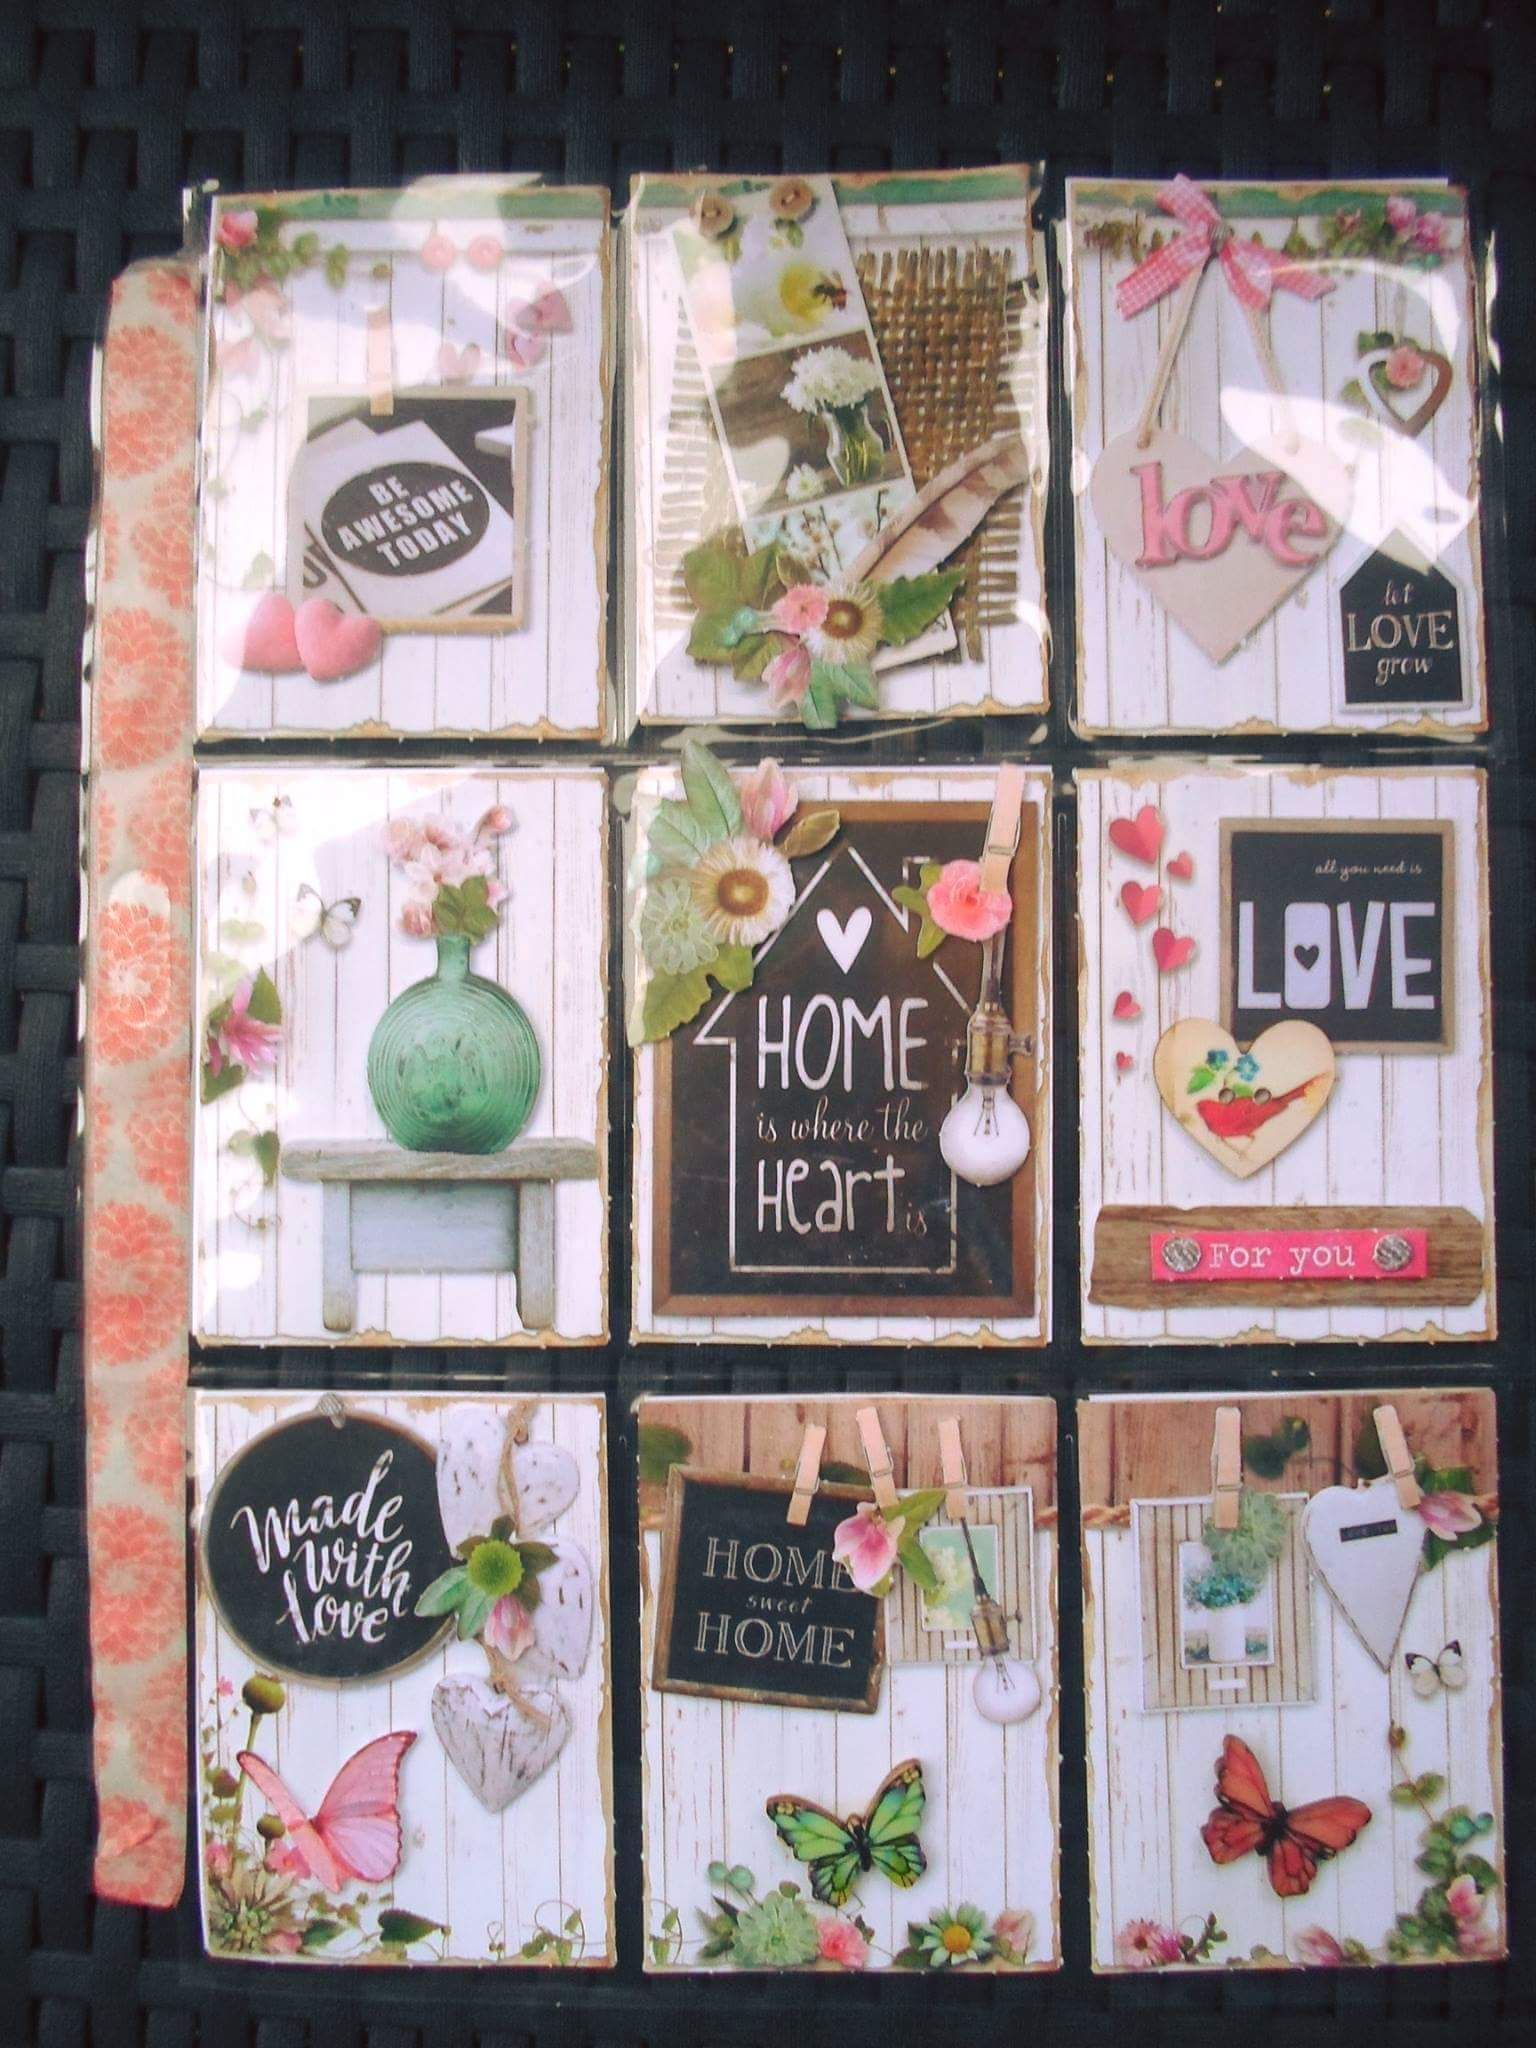 Home Sweet Home Pocket Letter